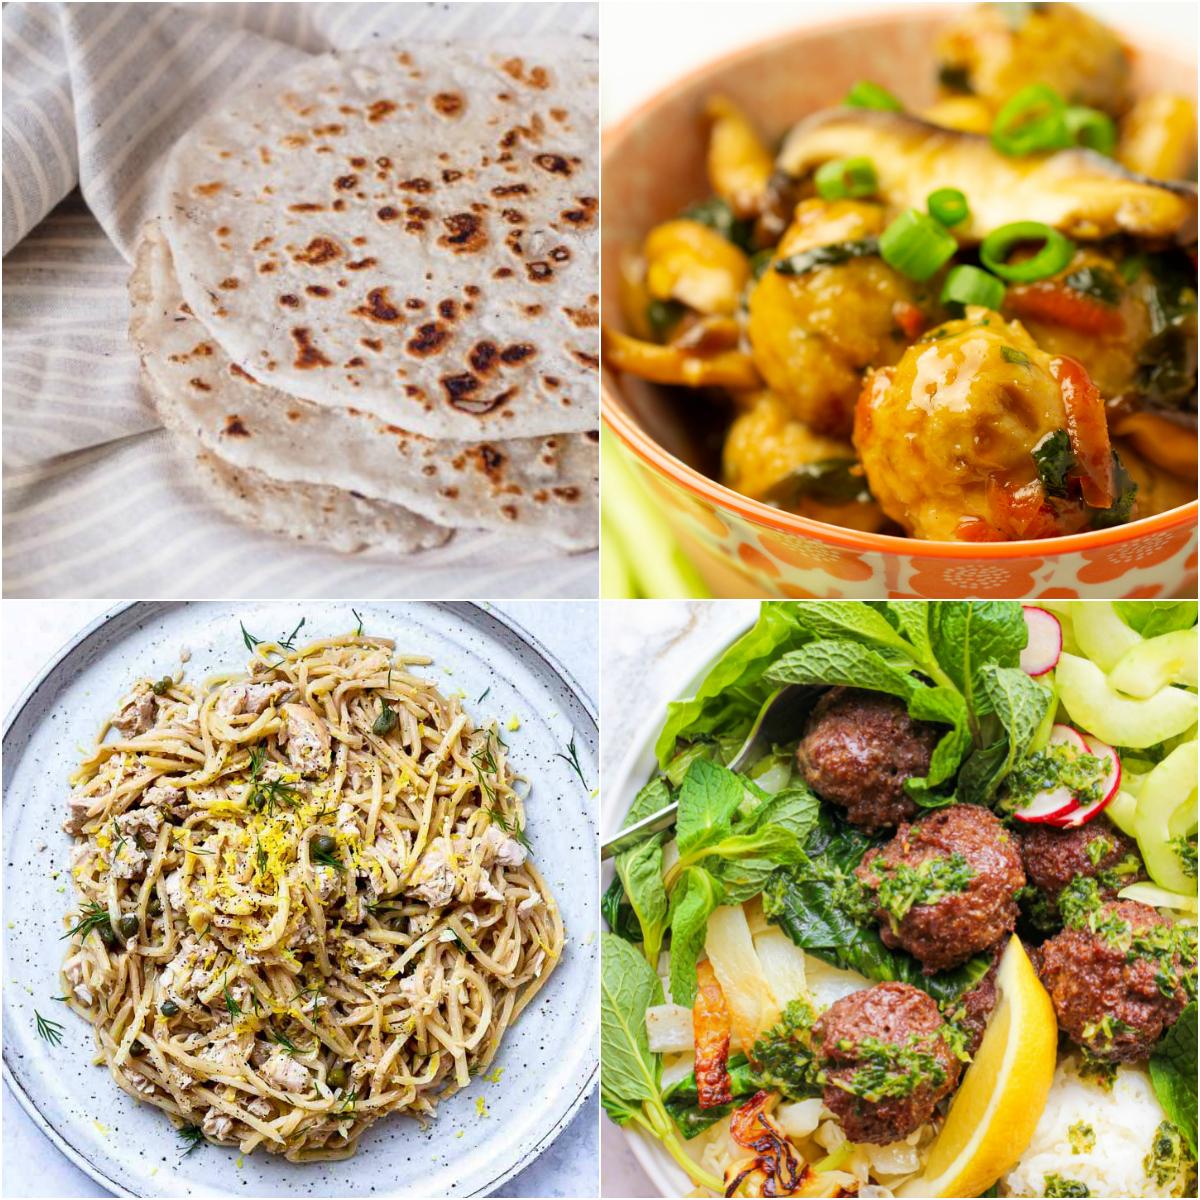 "Paleo AIP Recipe Roundtable #310 | Phoenix Helix - *Featured Recipes: Naan Bread, Tuna ""Pasta"", Teriyaki Meatball Stir-Fry, and Asian Meatballs Sheet Pan Dinner"